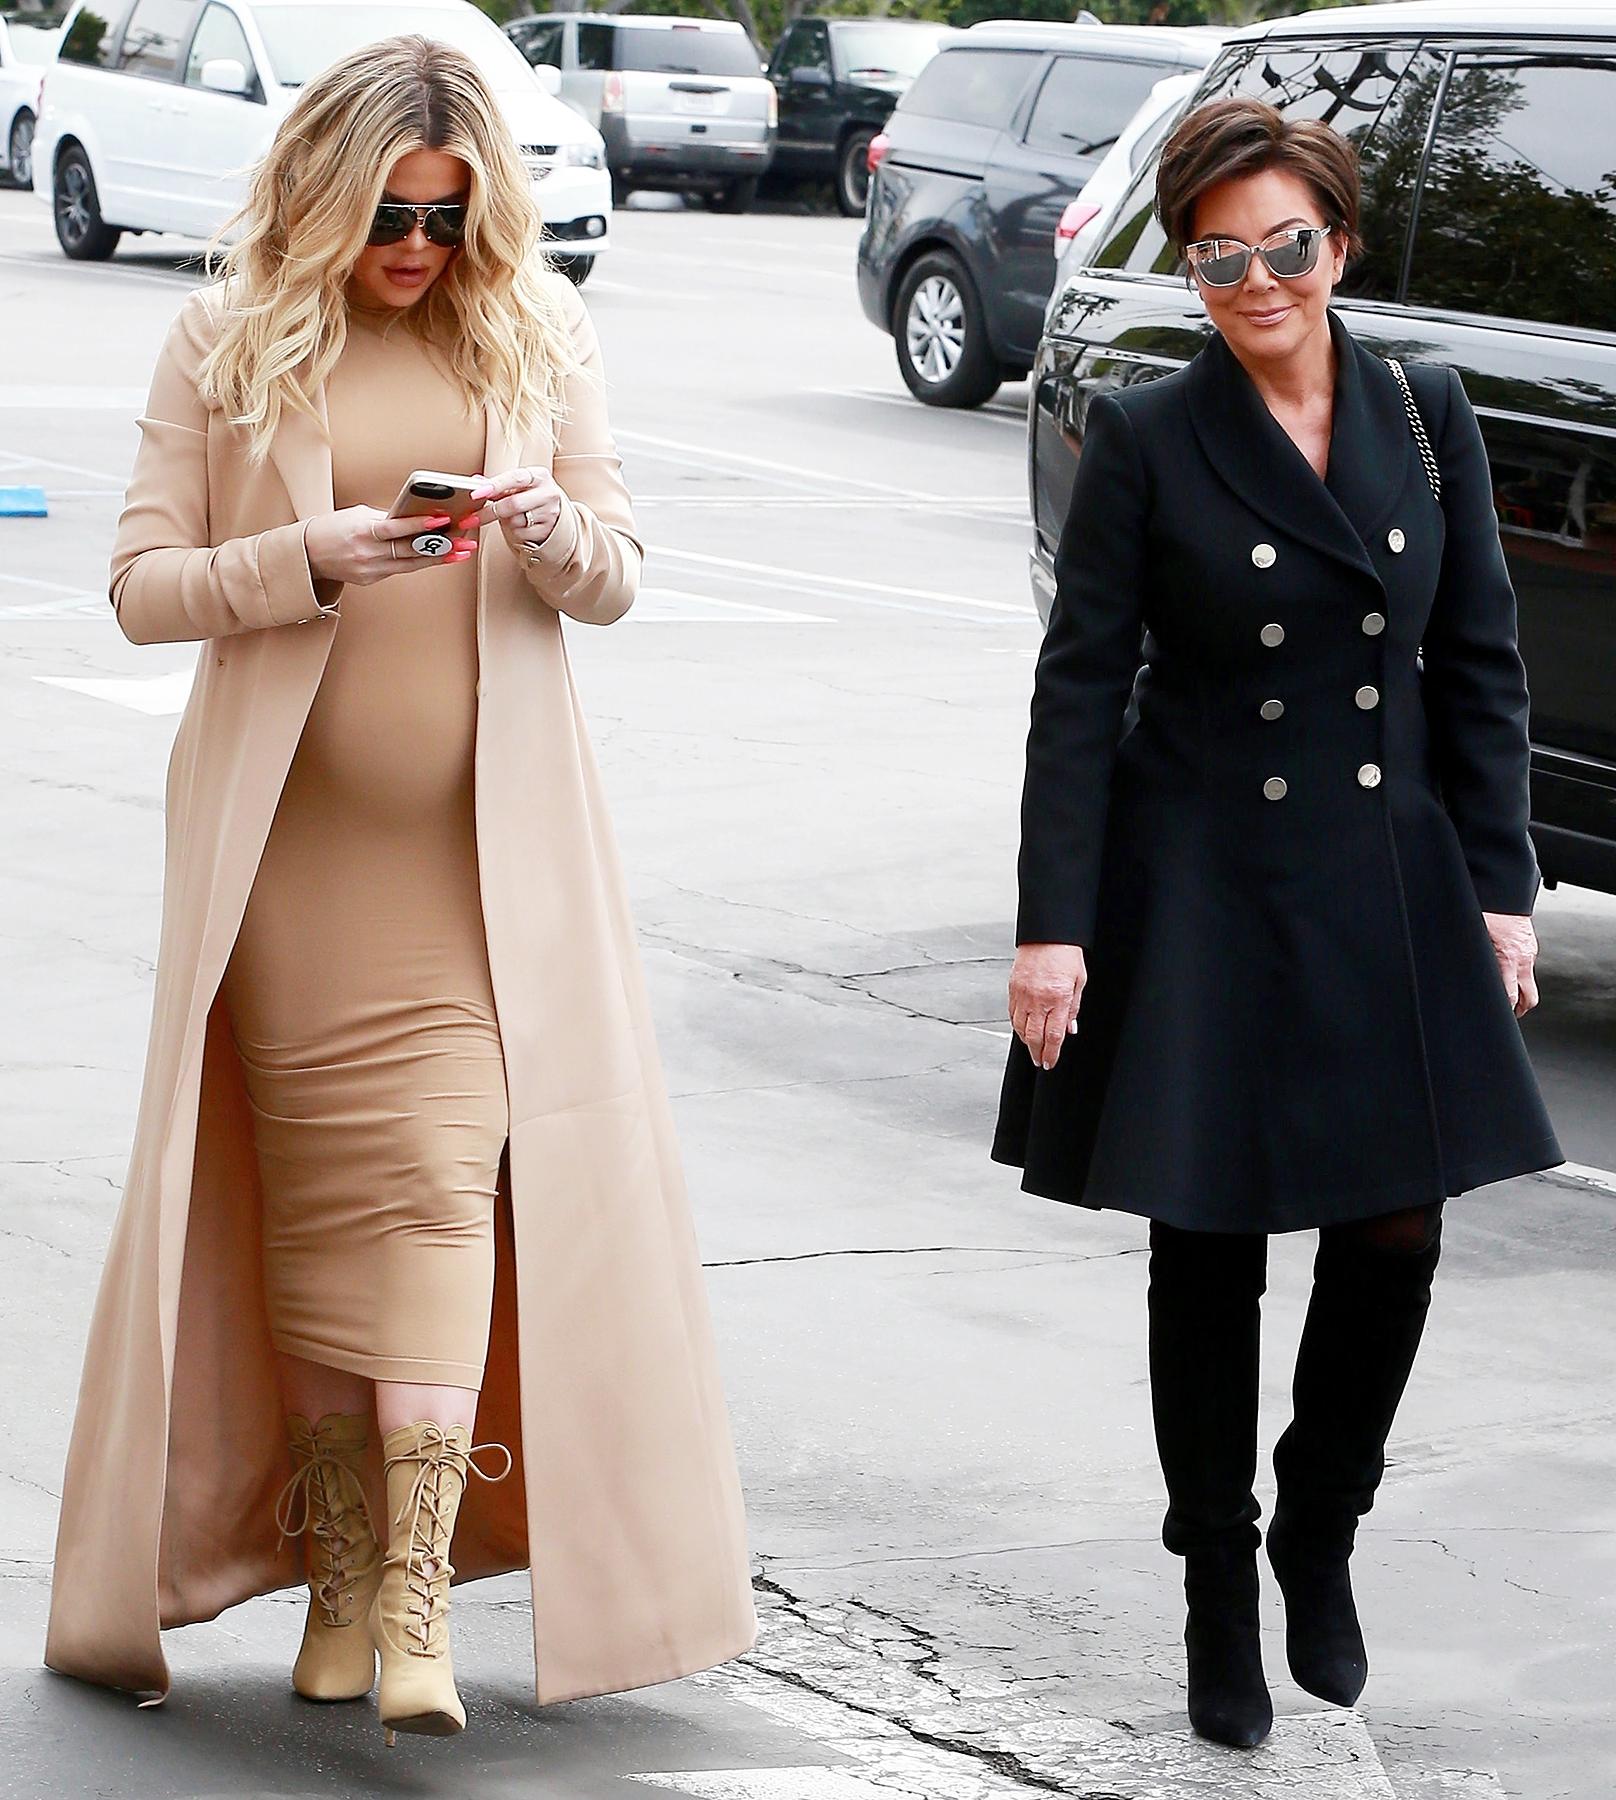 Pregnant Khloe Kardashian Shows f Baby Bump at 8 Months Pics